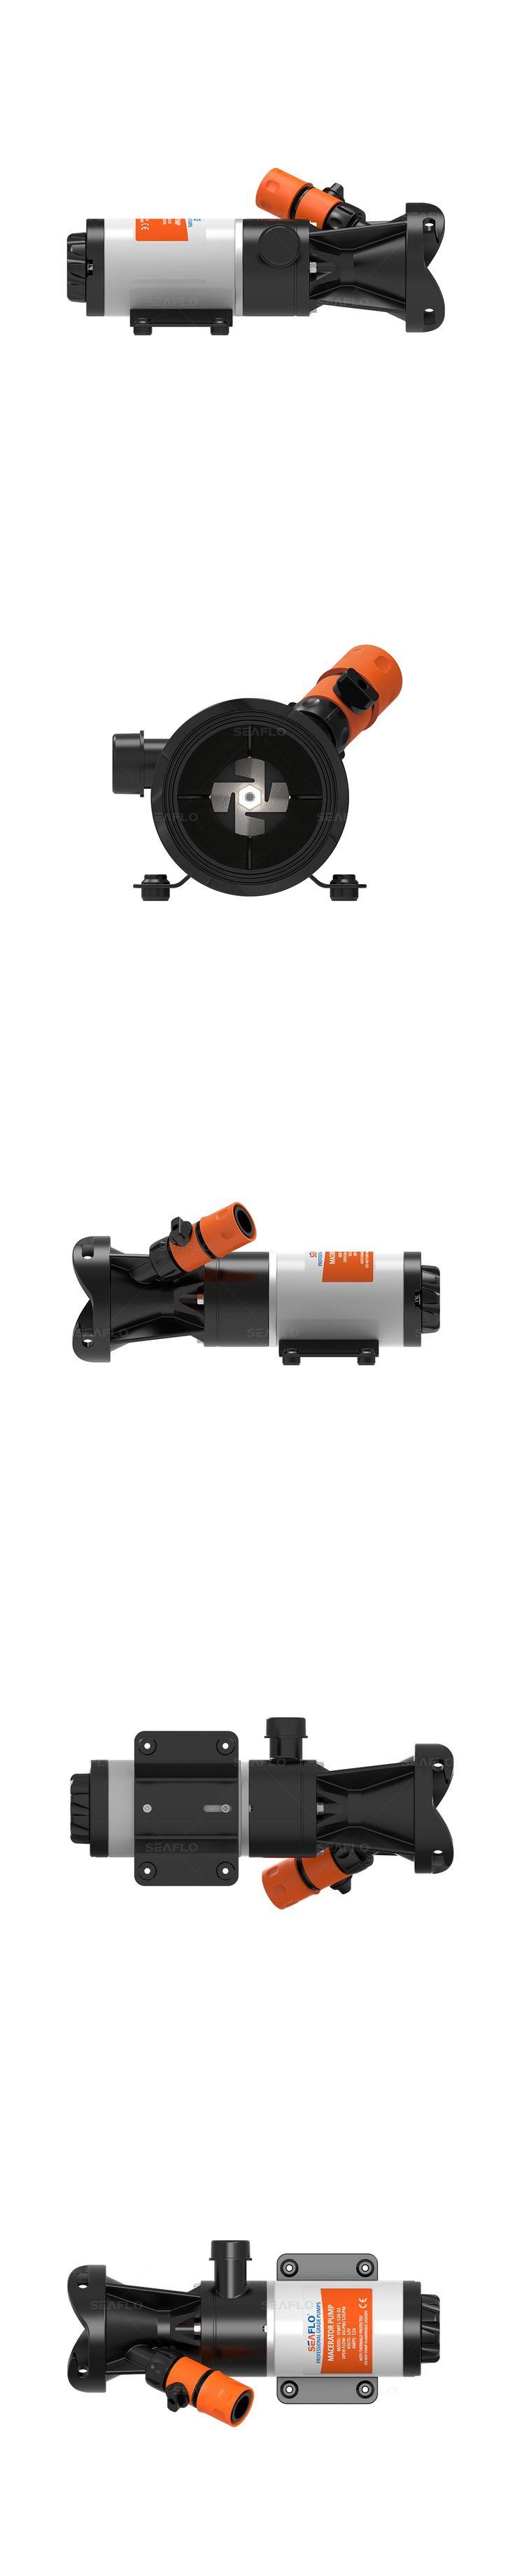 Sewage Pump SEAFLO 24V Sump Effluent 12 GPM 45 LPM Waste Water Dewatering Pumps for Marine RV Caravan Toilet